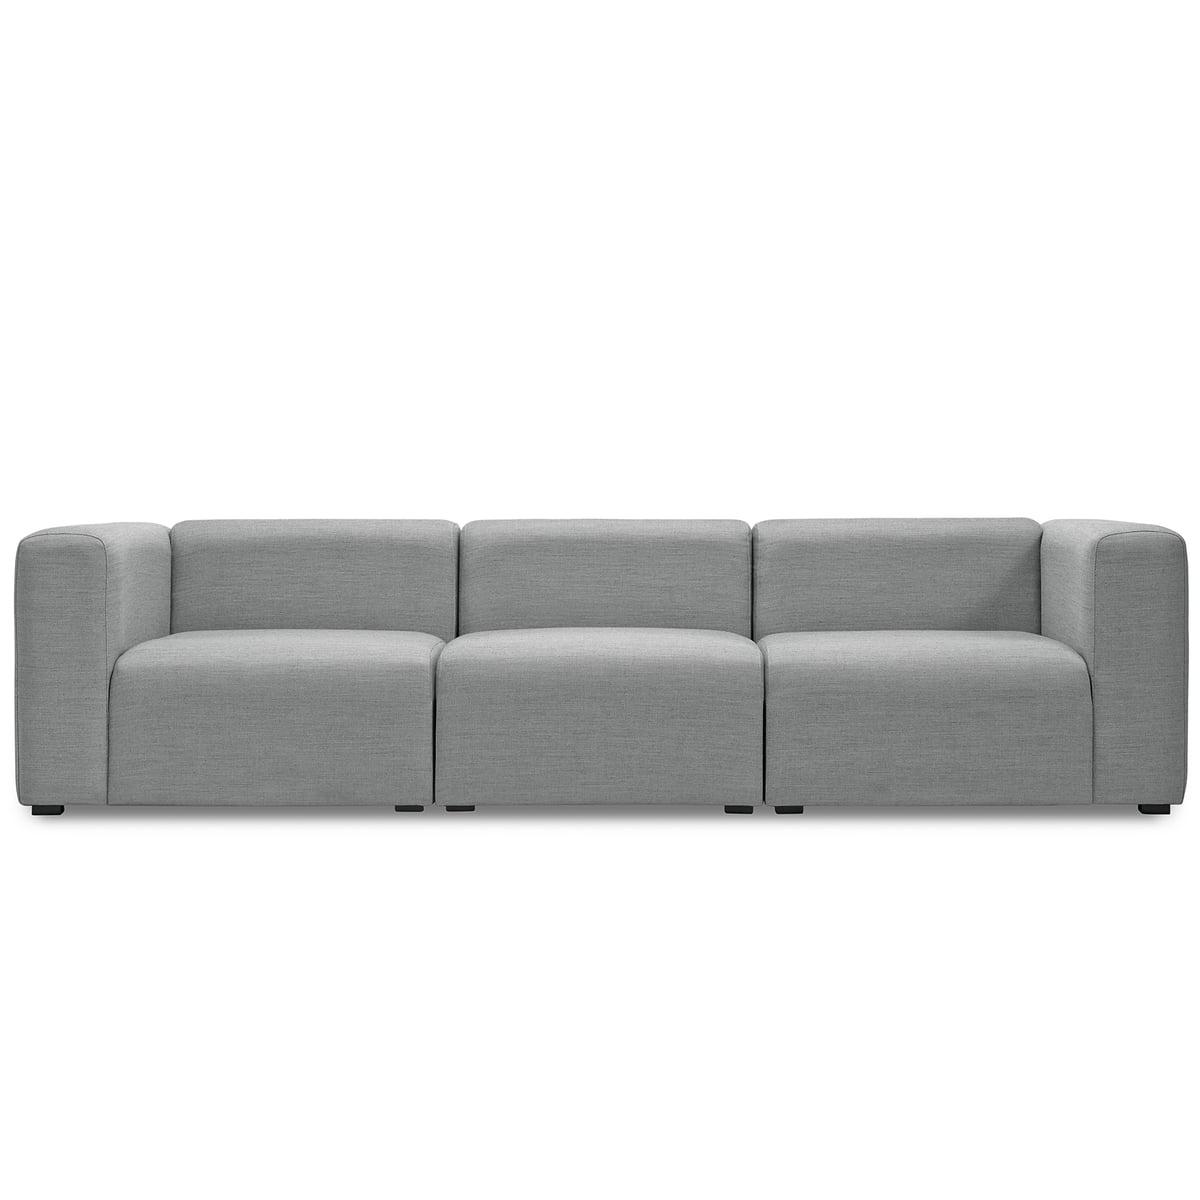 mags sofa 3 sitzer von hay. Black Bedroom Furniture Sets. Home Design Ideas